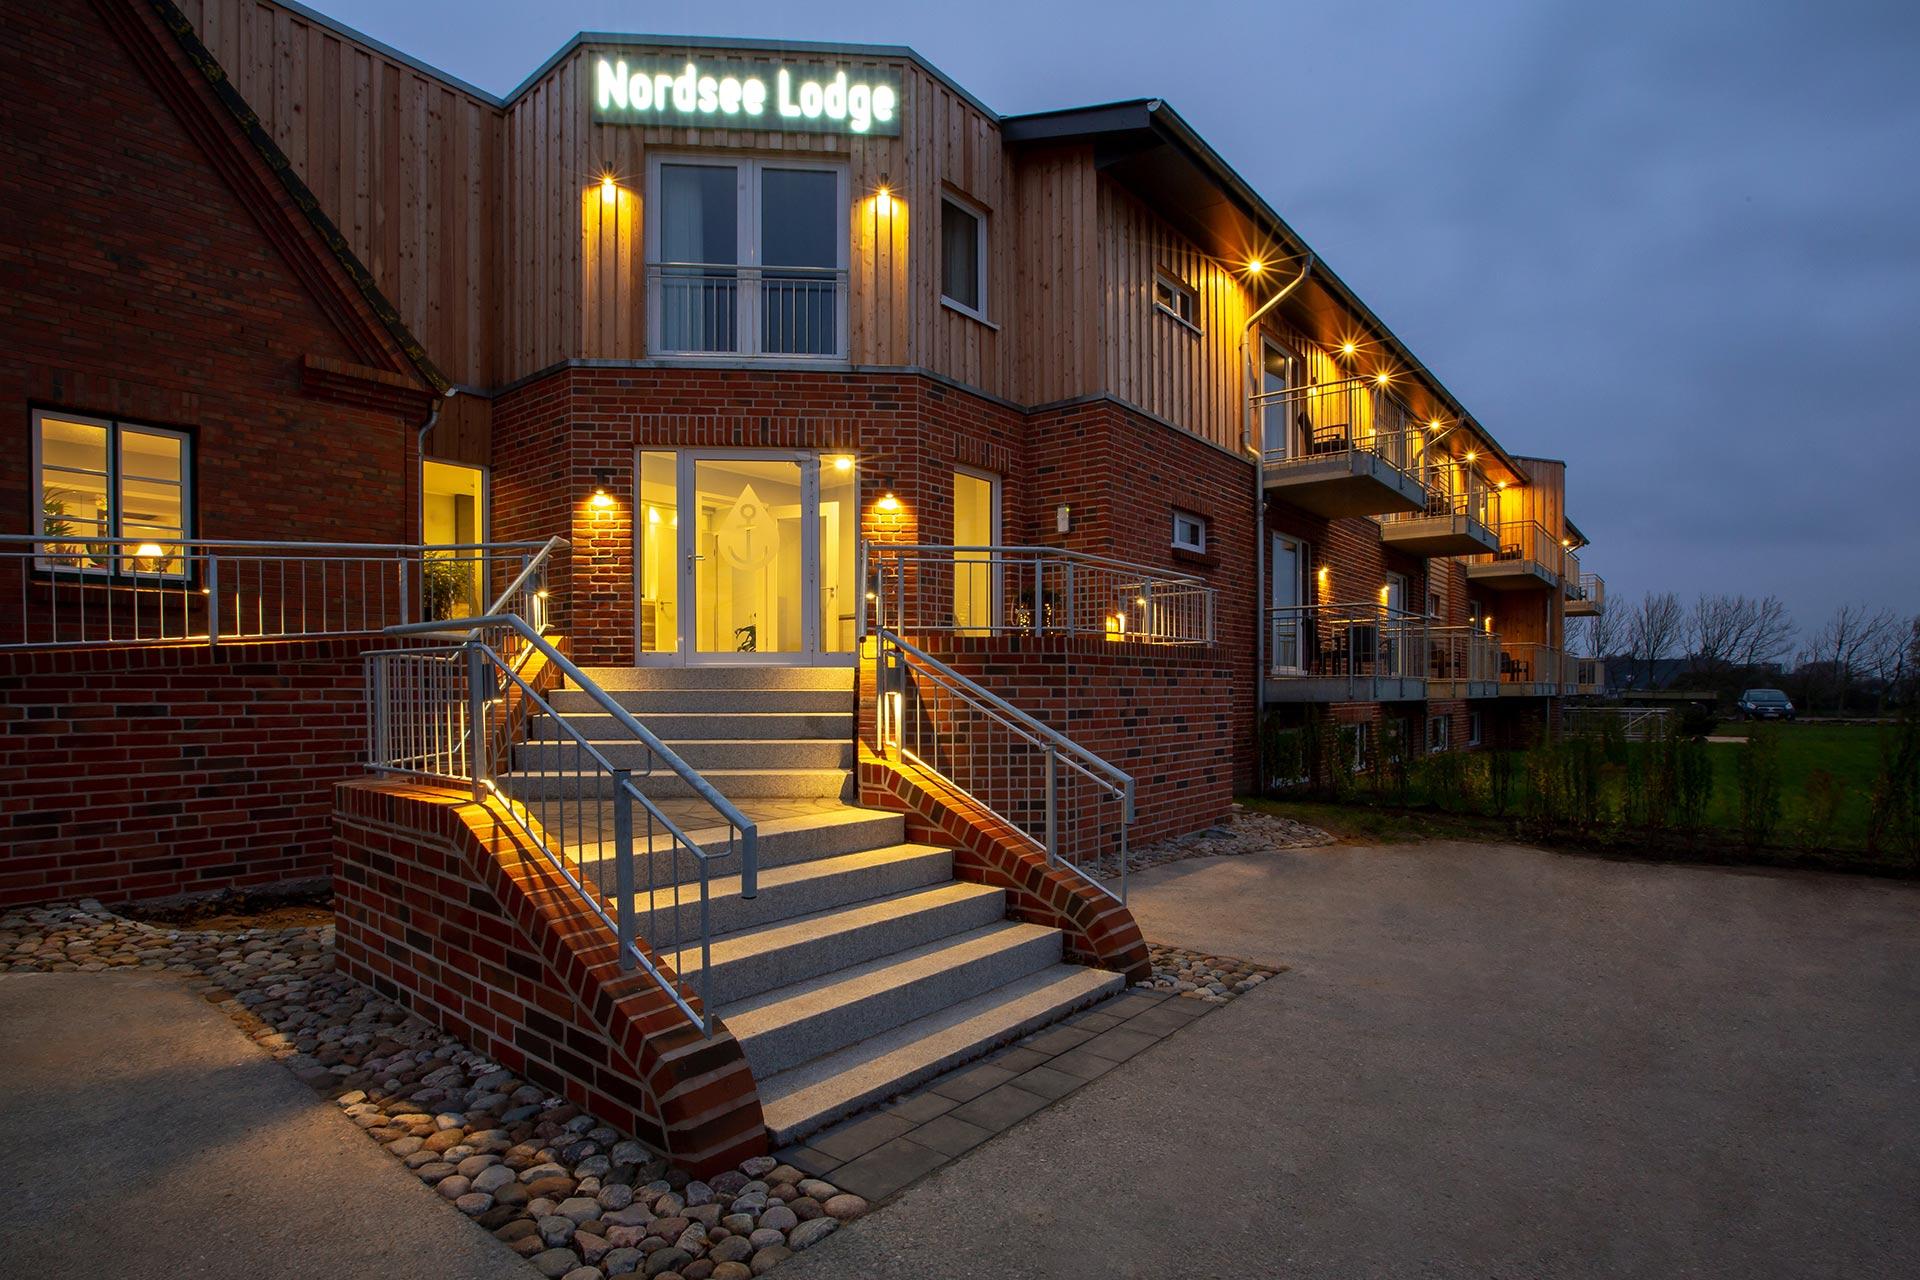 Hotel Nordsee Lodge Doppelzimmer mit Balkon